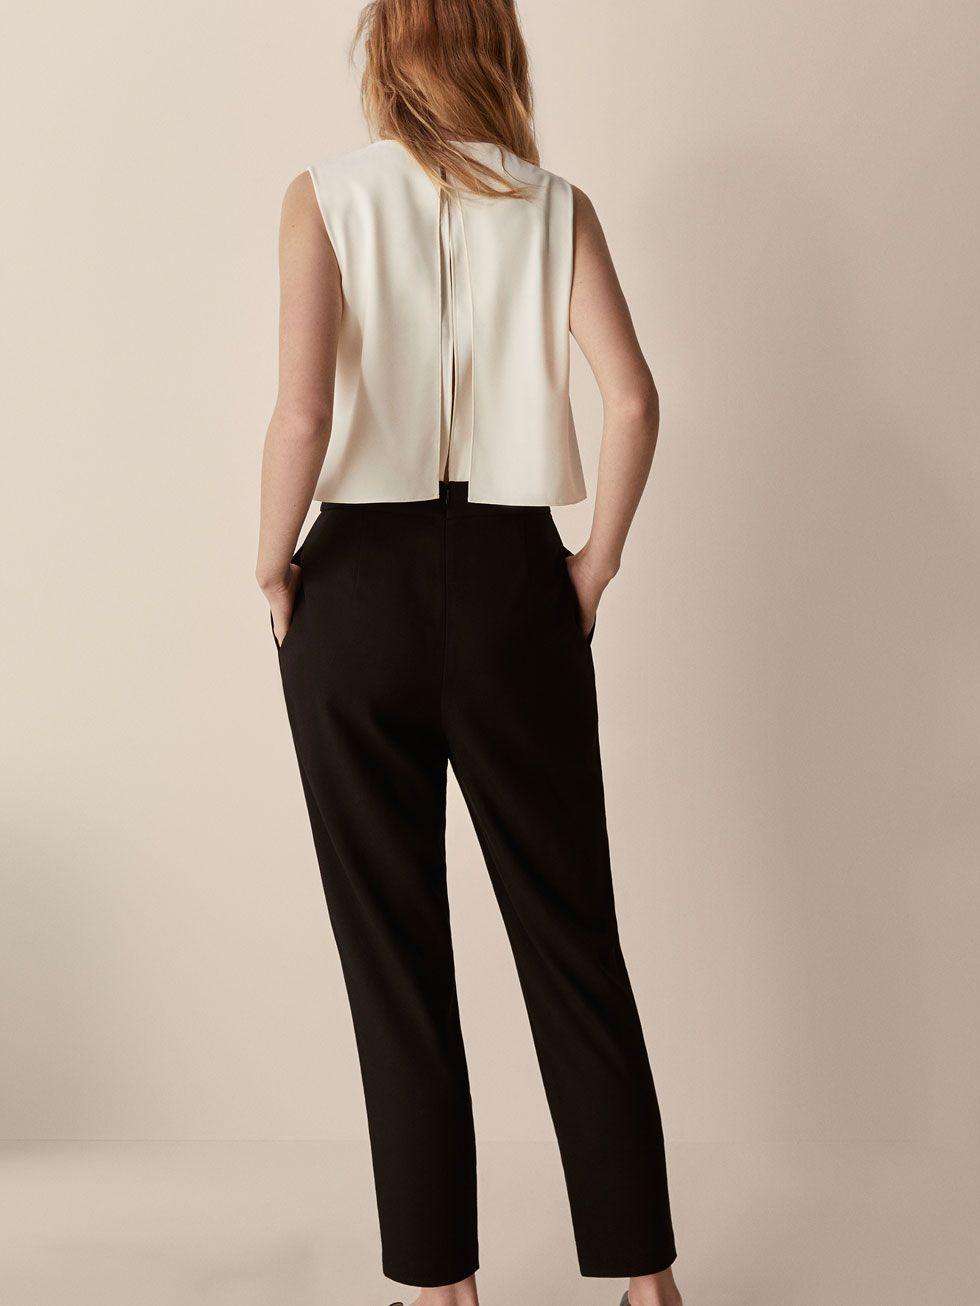 jumpsuits - women - massimo dutti | modestil, legere